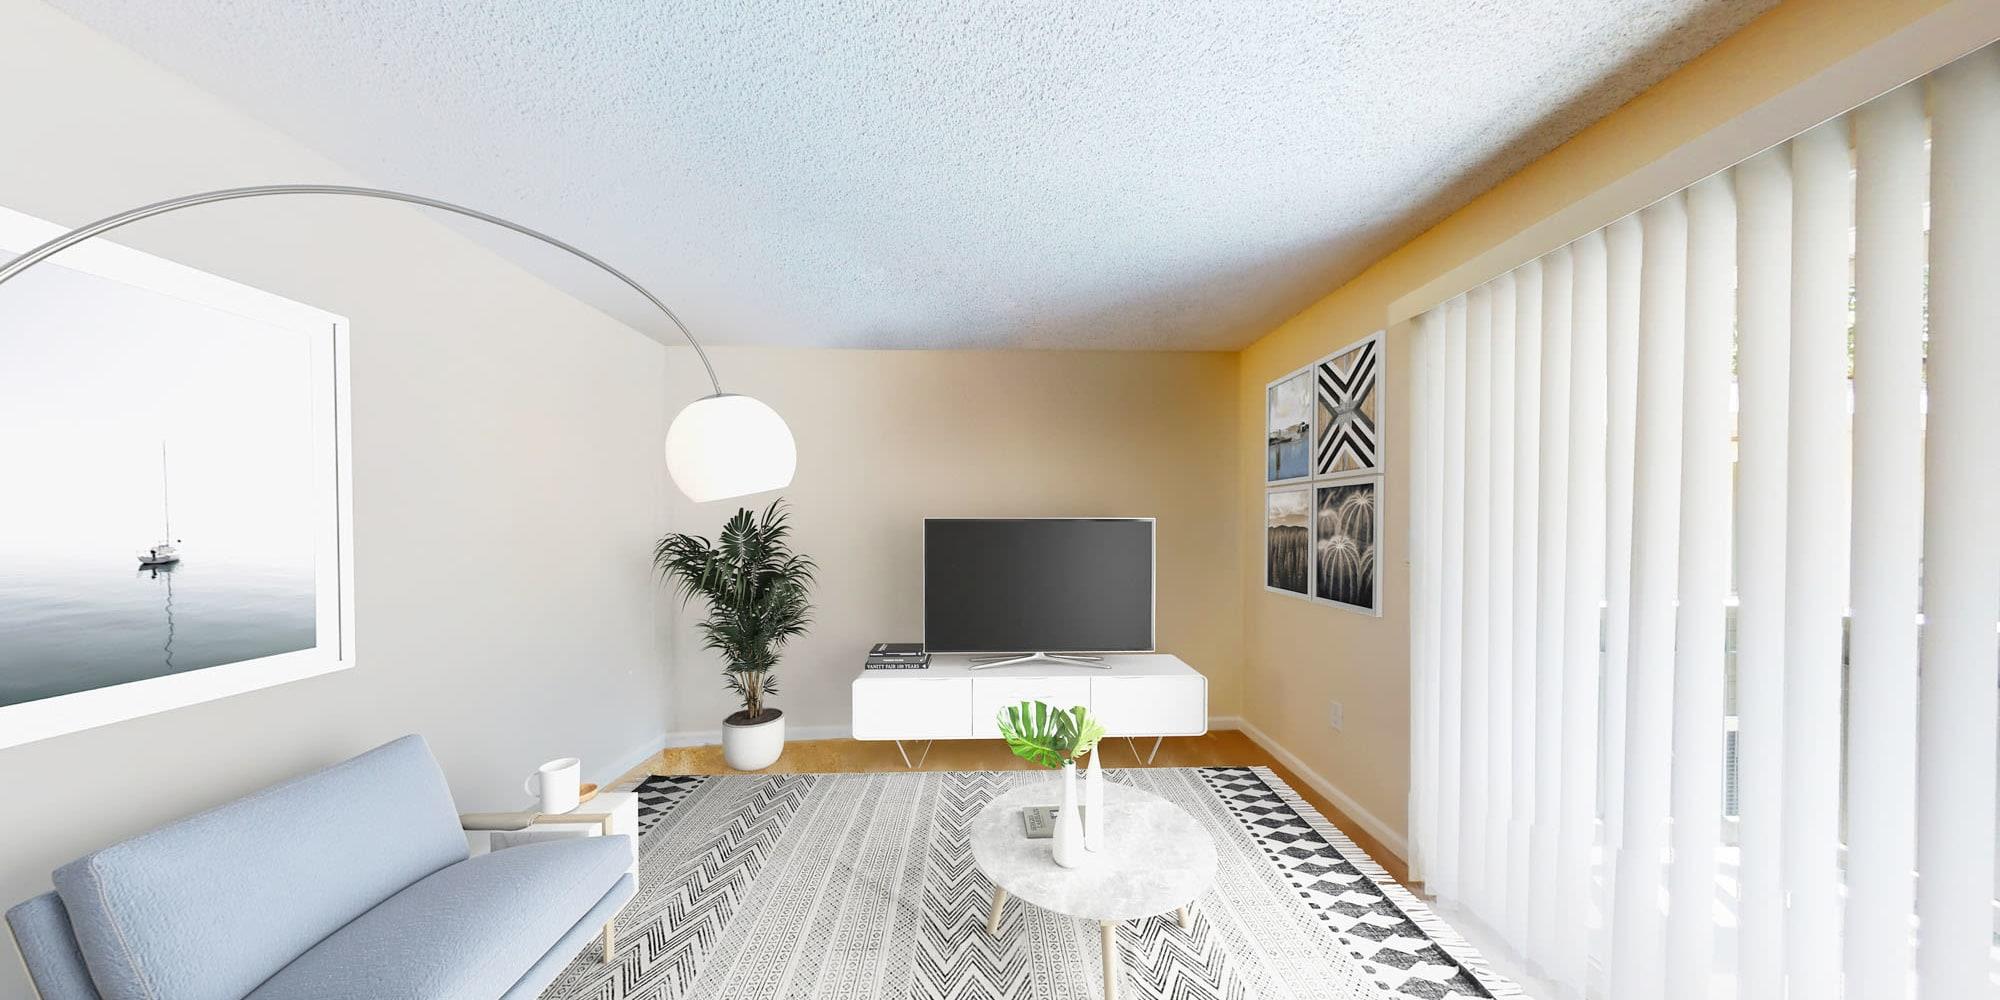 Comfortably furnished model home's living area at Pleasanton Glen Apartment Homes in Pleasanton, California